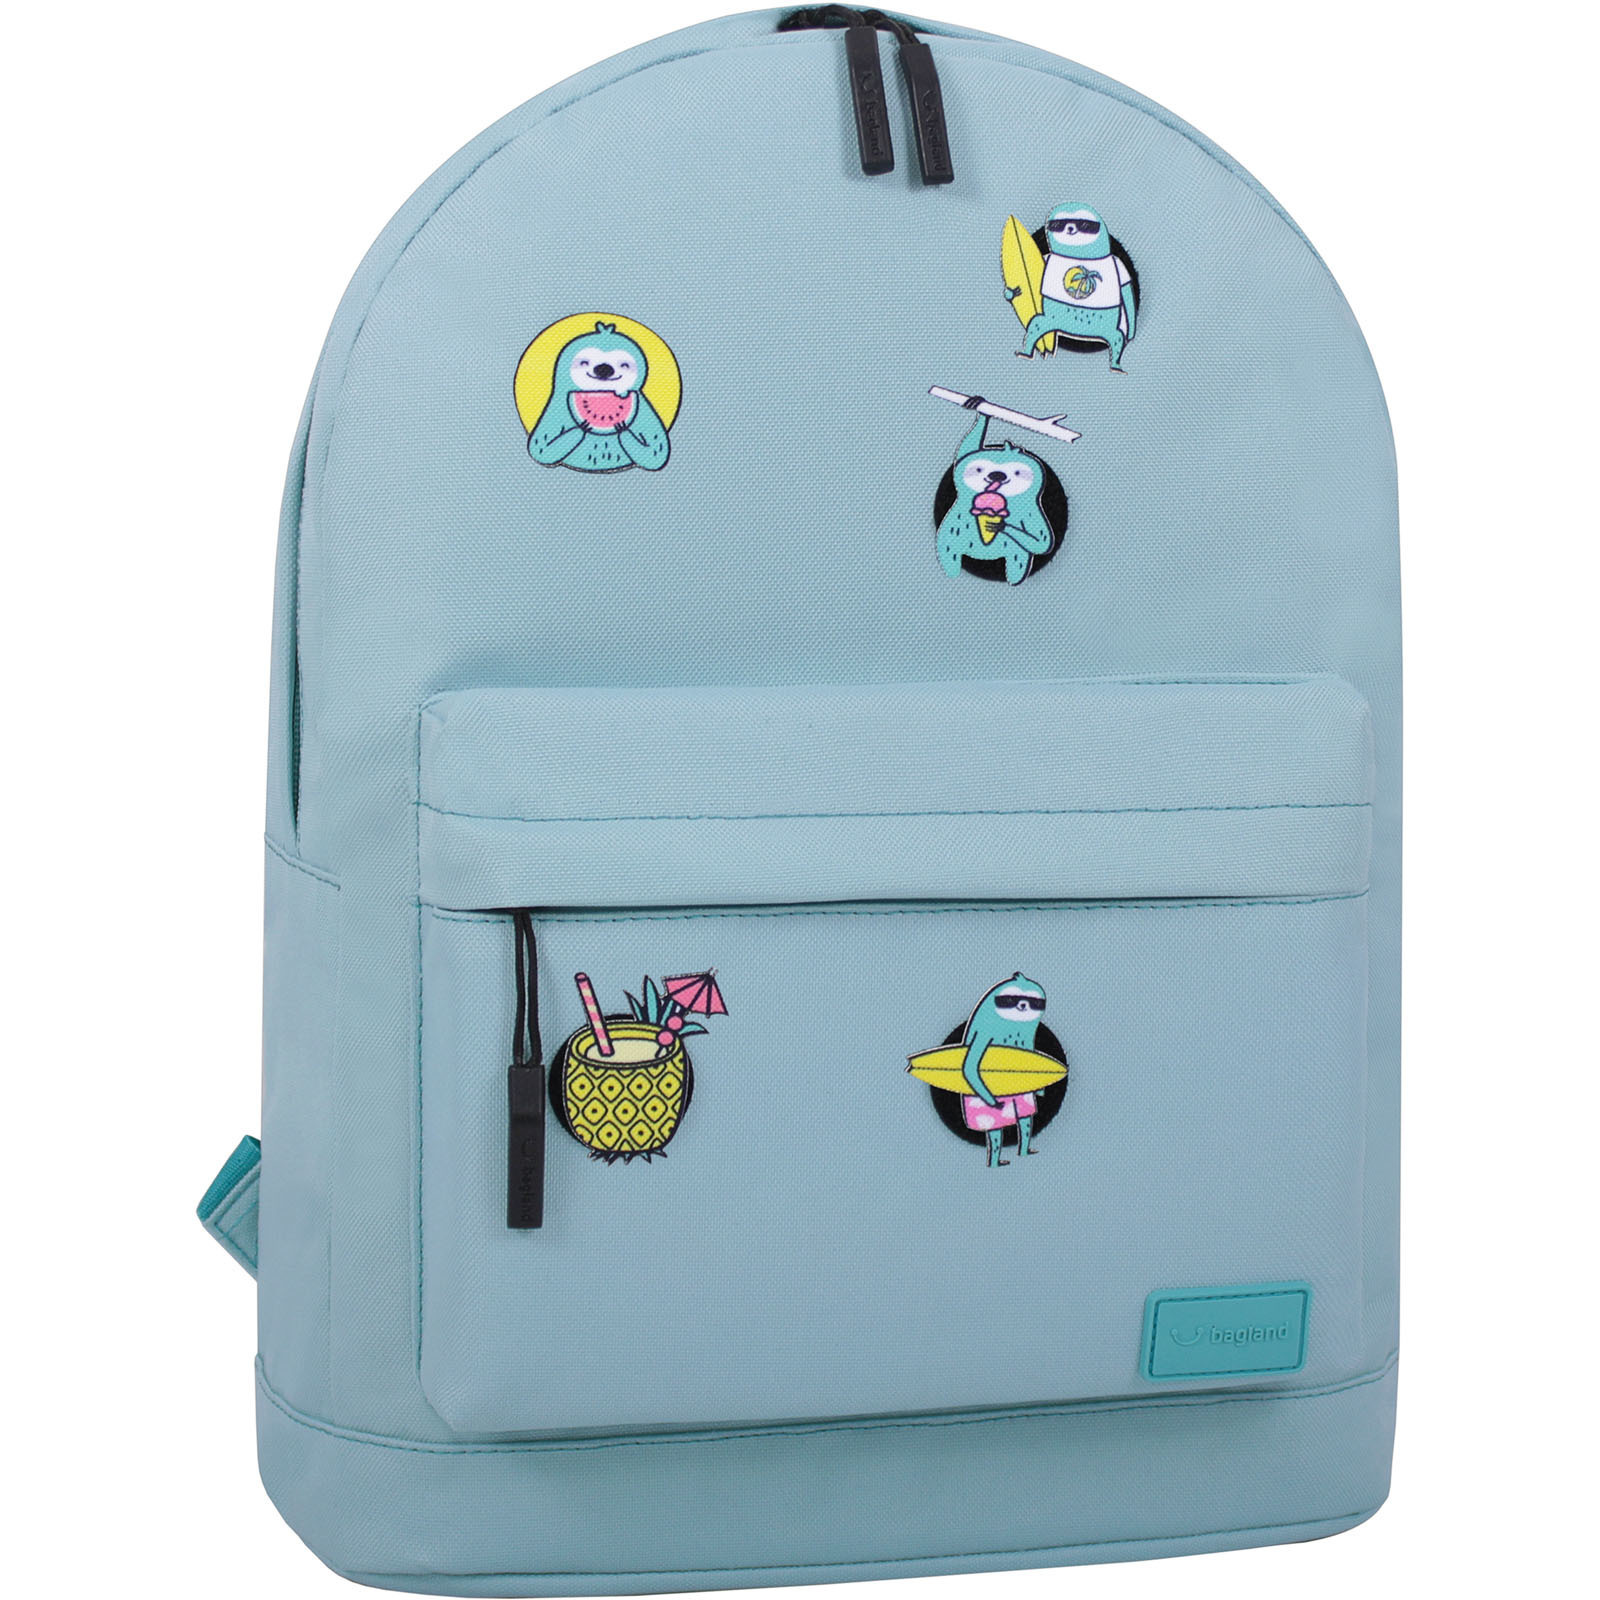 Молодежные рюкзаки Рюкзак Bagland Молодежный W/R 17 л. 252 Тифани (00533662 Ш) IMG_2931.JPG